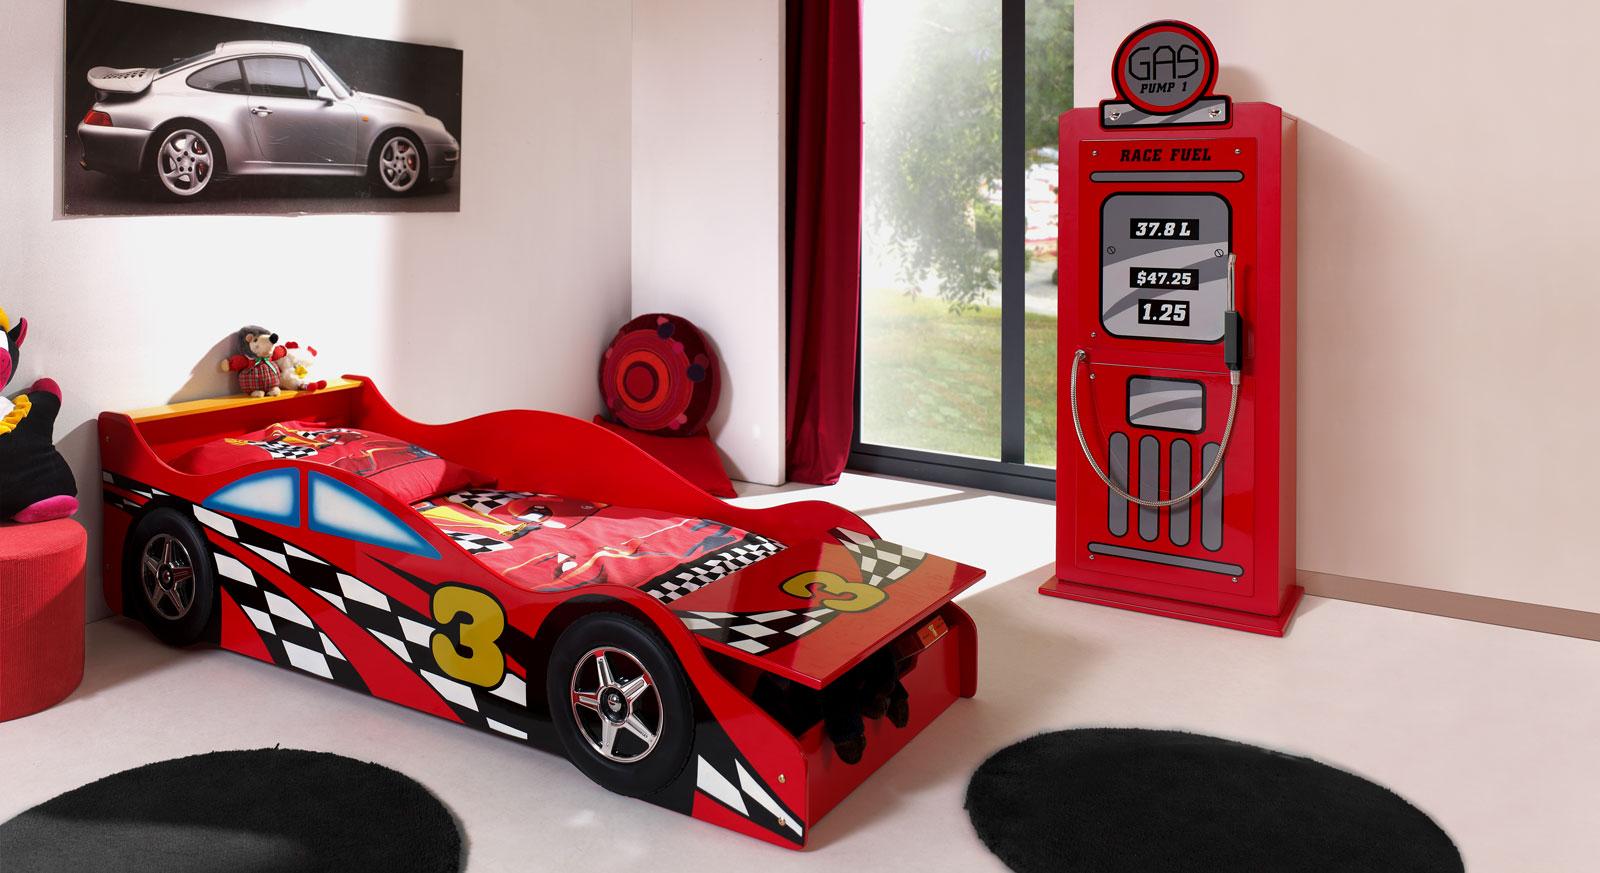 Komplett-Kinderzimmer Highway aus rot lackiertem MDF